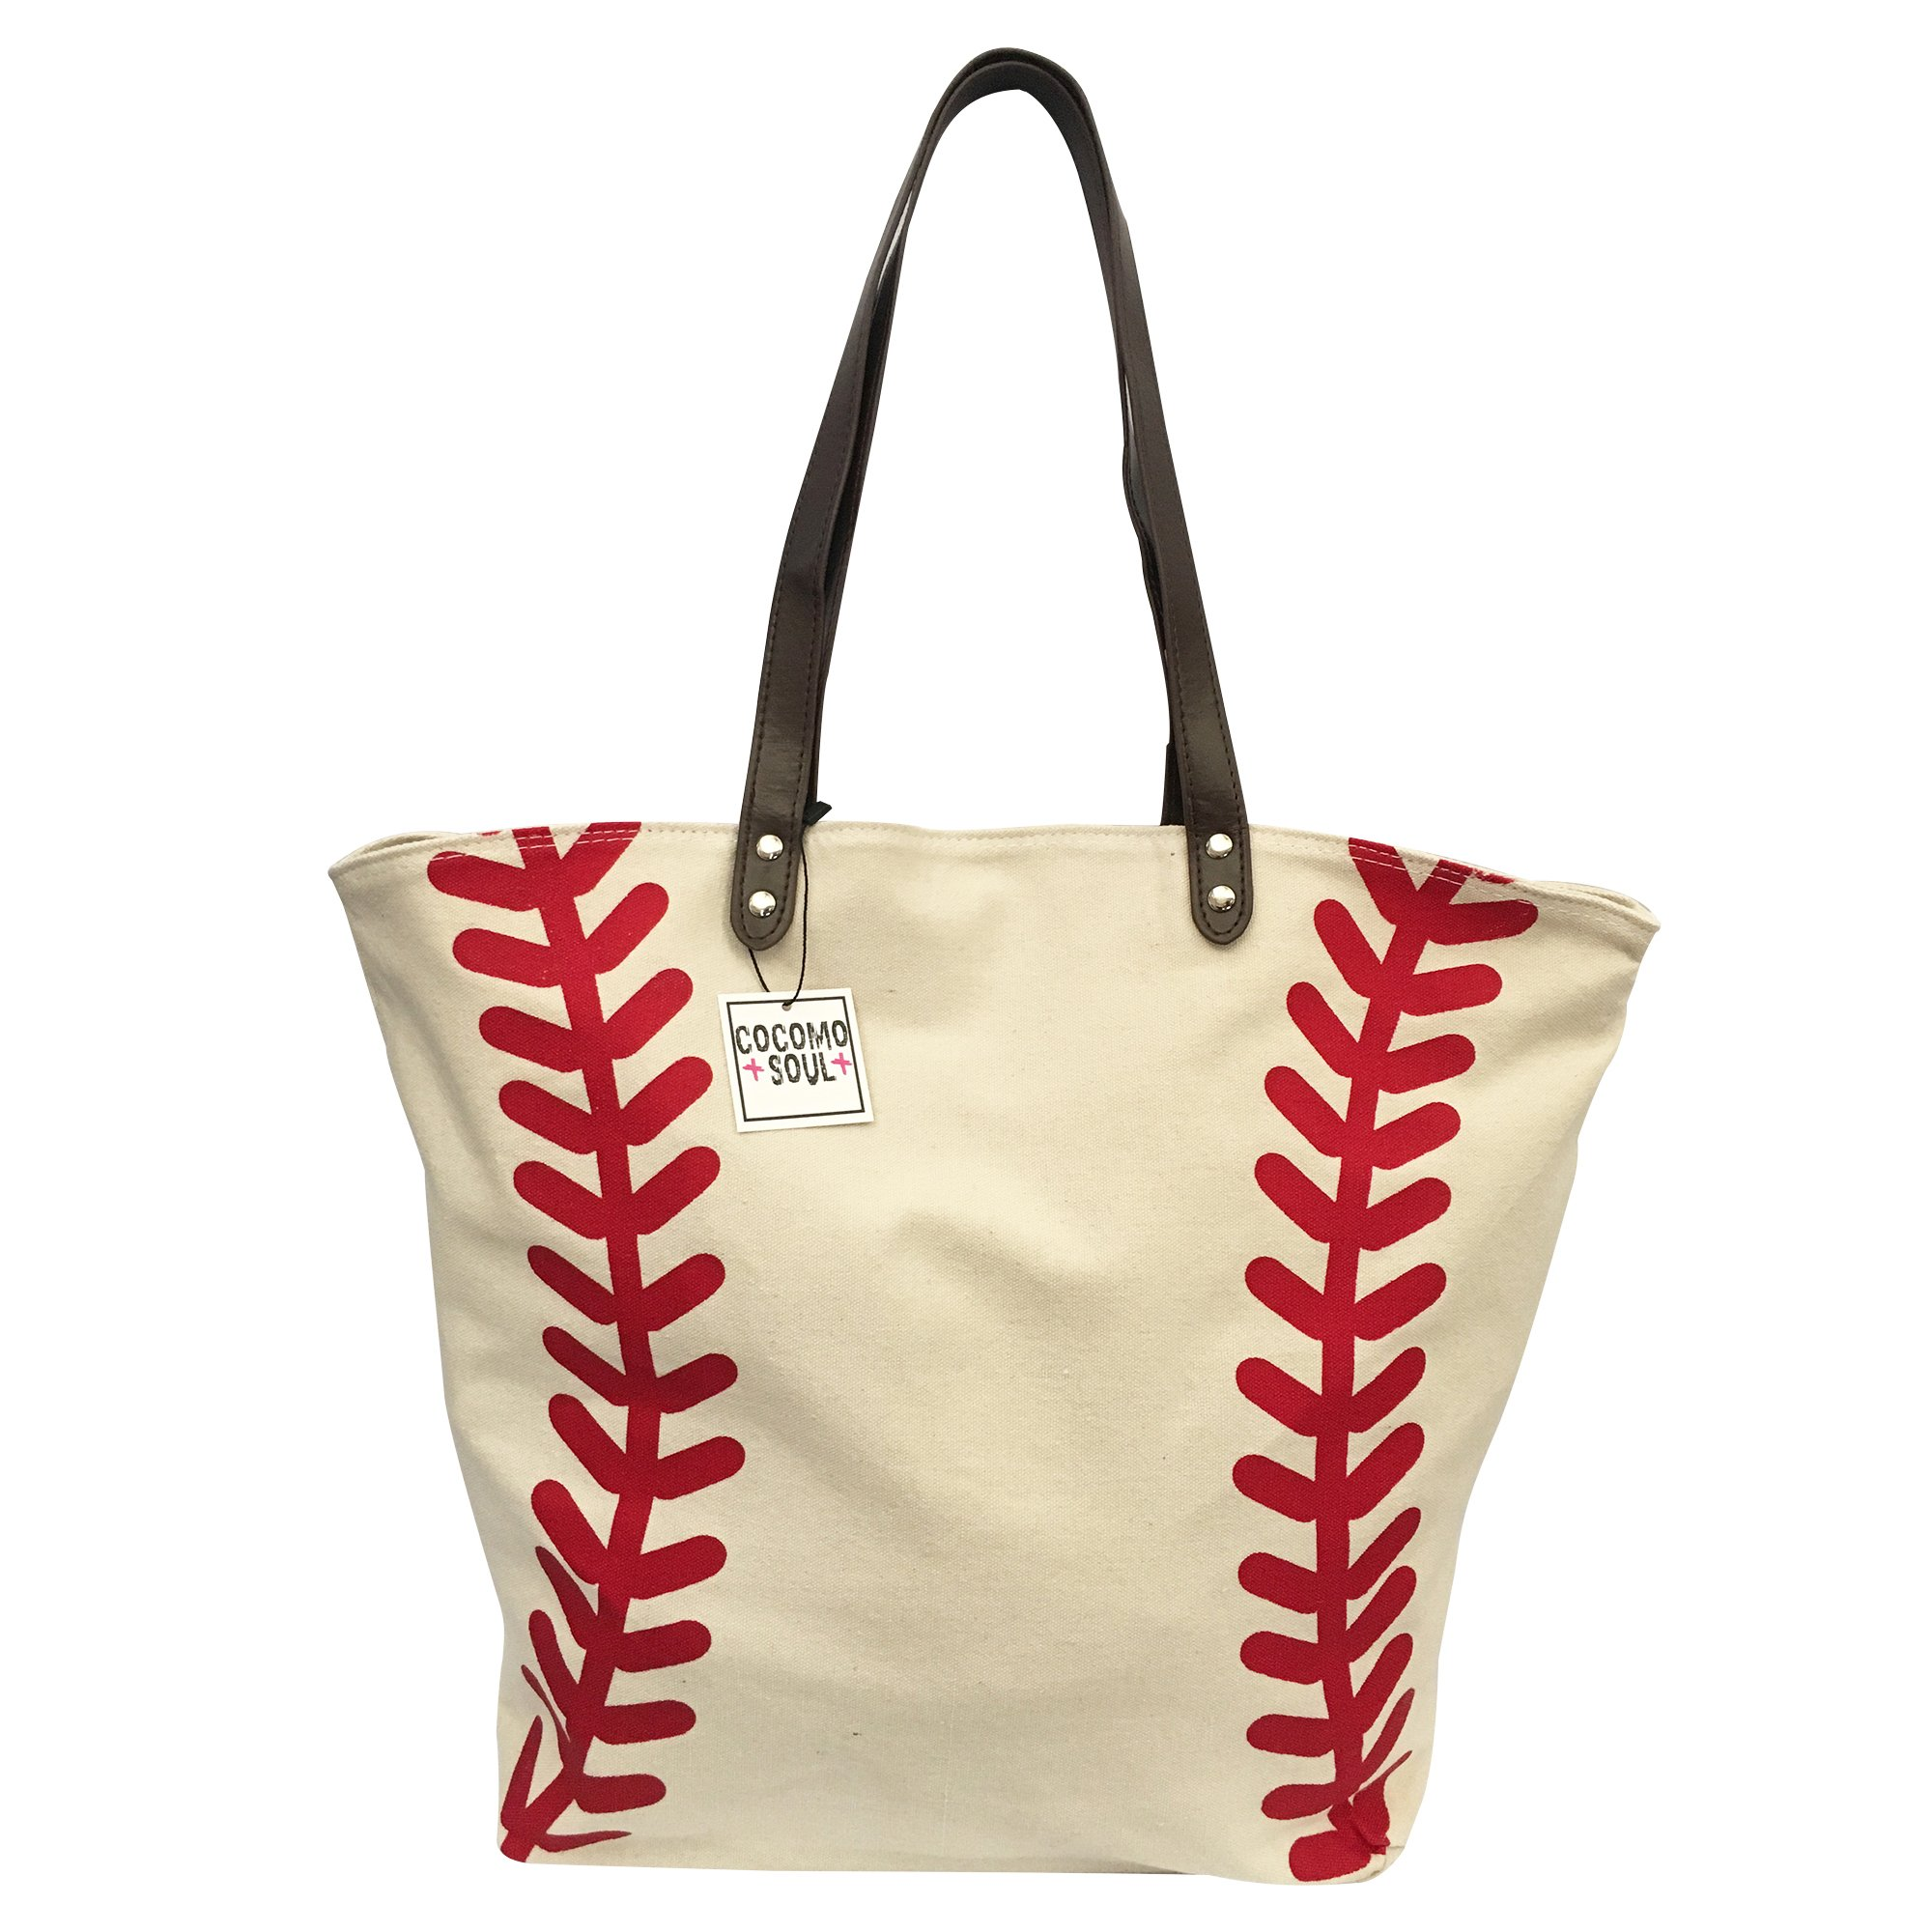 Baseball Canvas Tote Bag Handbag Large Oversize Sports 20 x 17 Inches